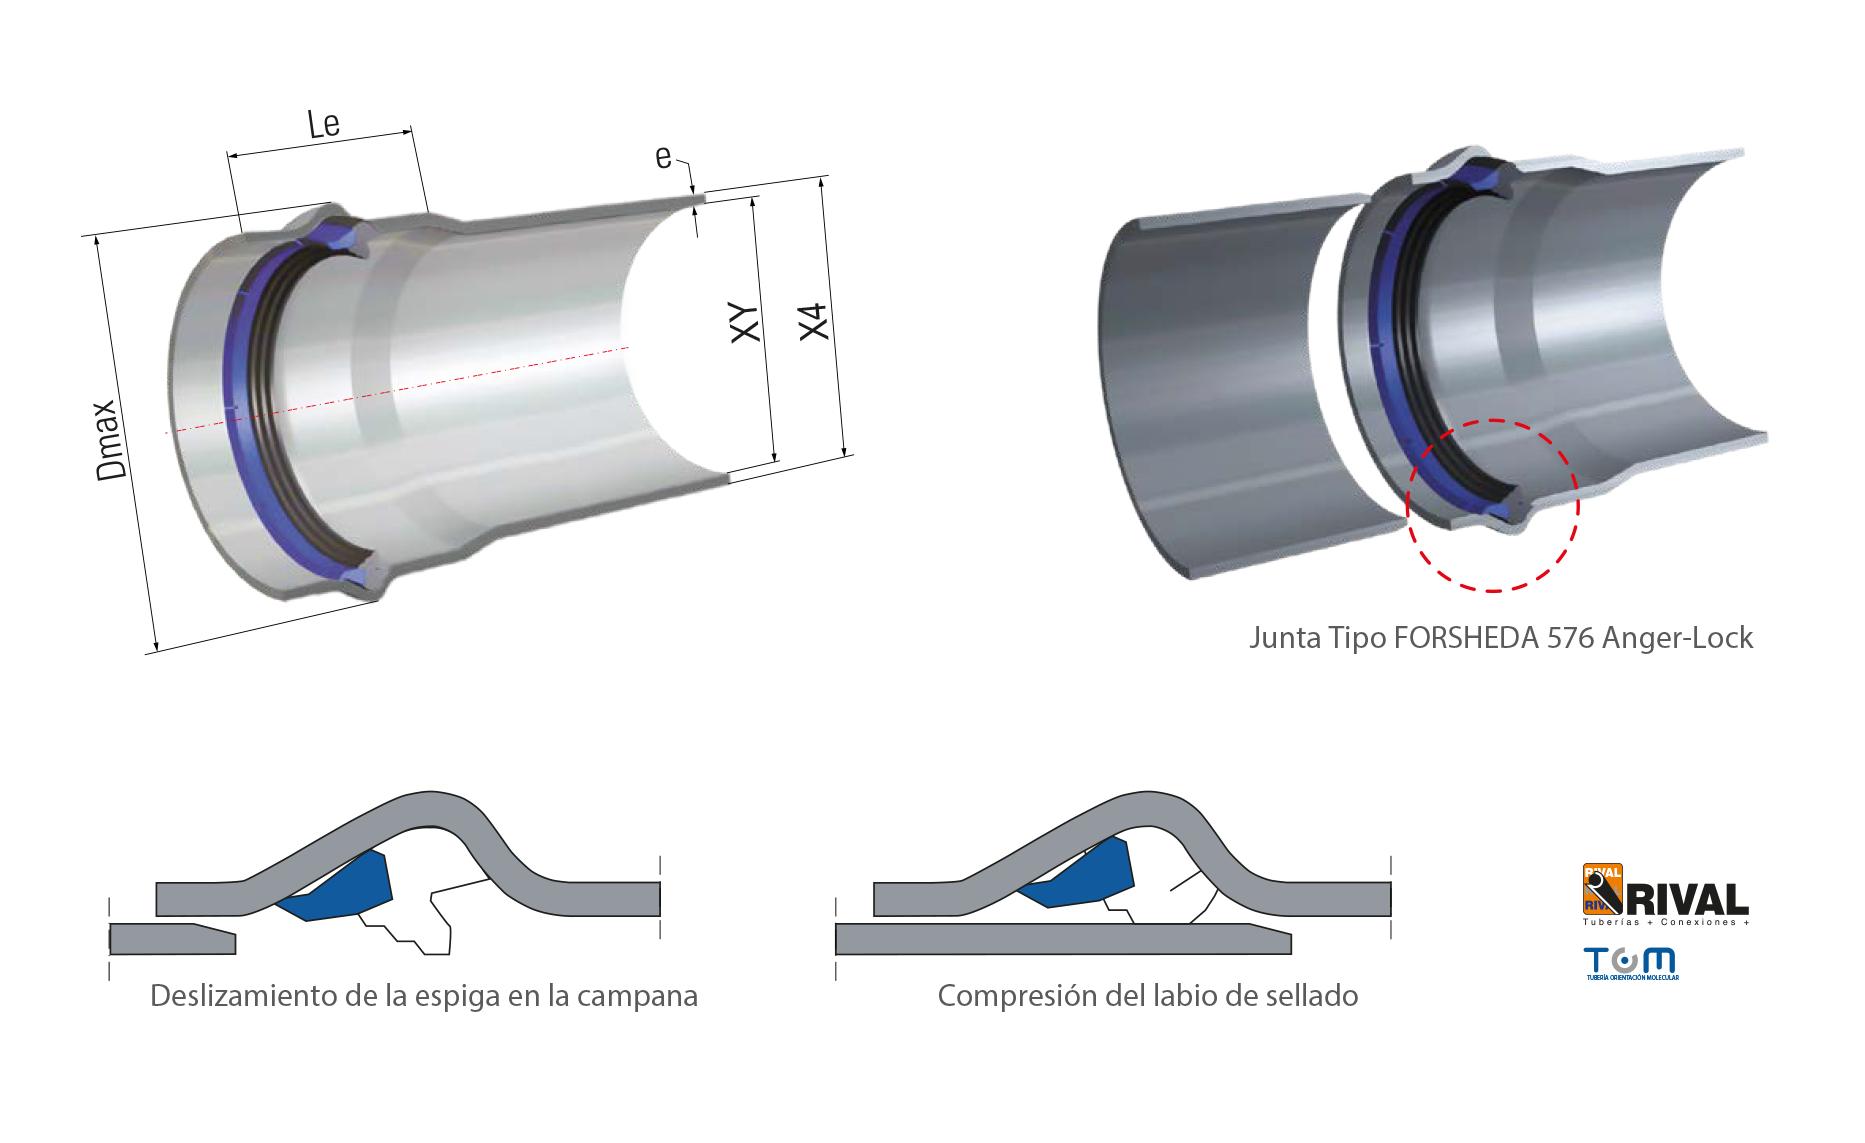 union-elastomerica-tom-biax-rival-plastigma-diametro-los-hidros-riobamba-quito-latacunga-ecuador